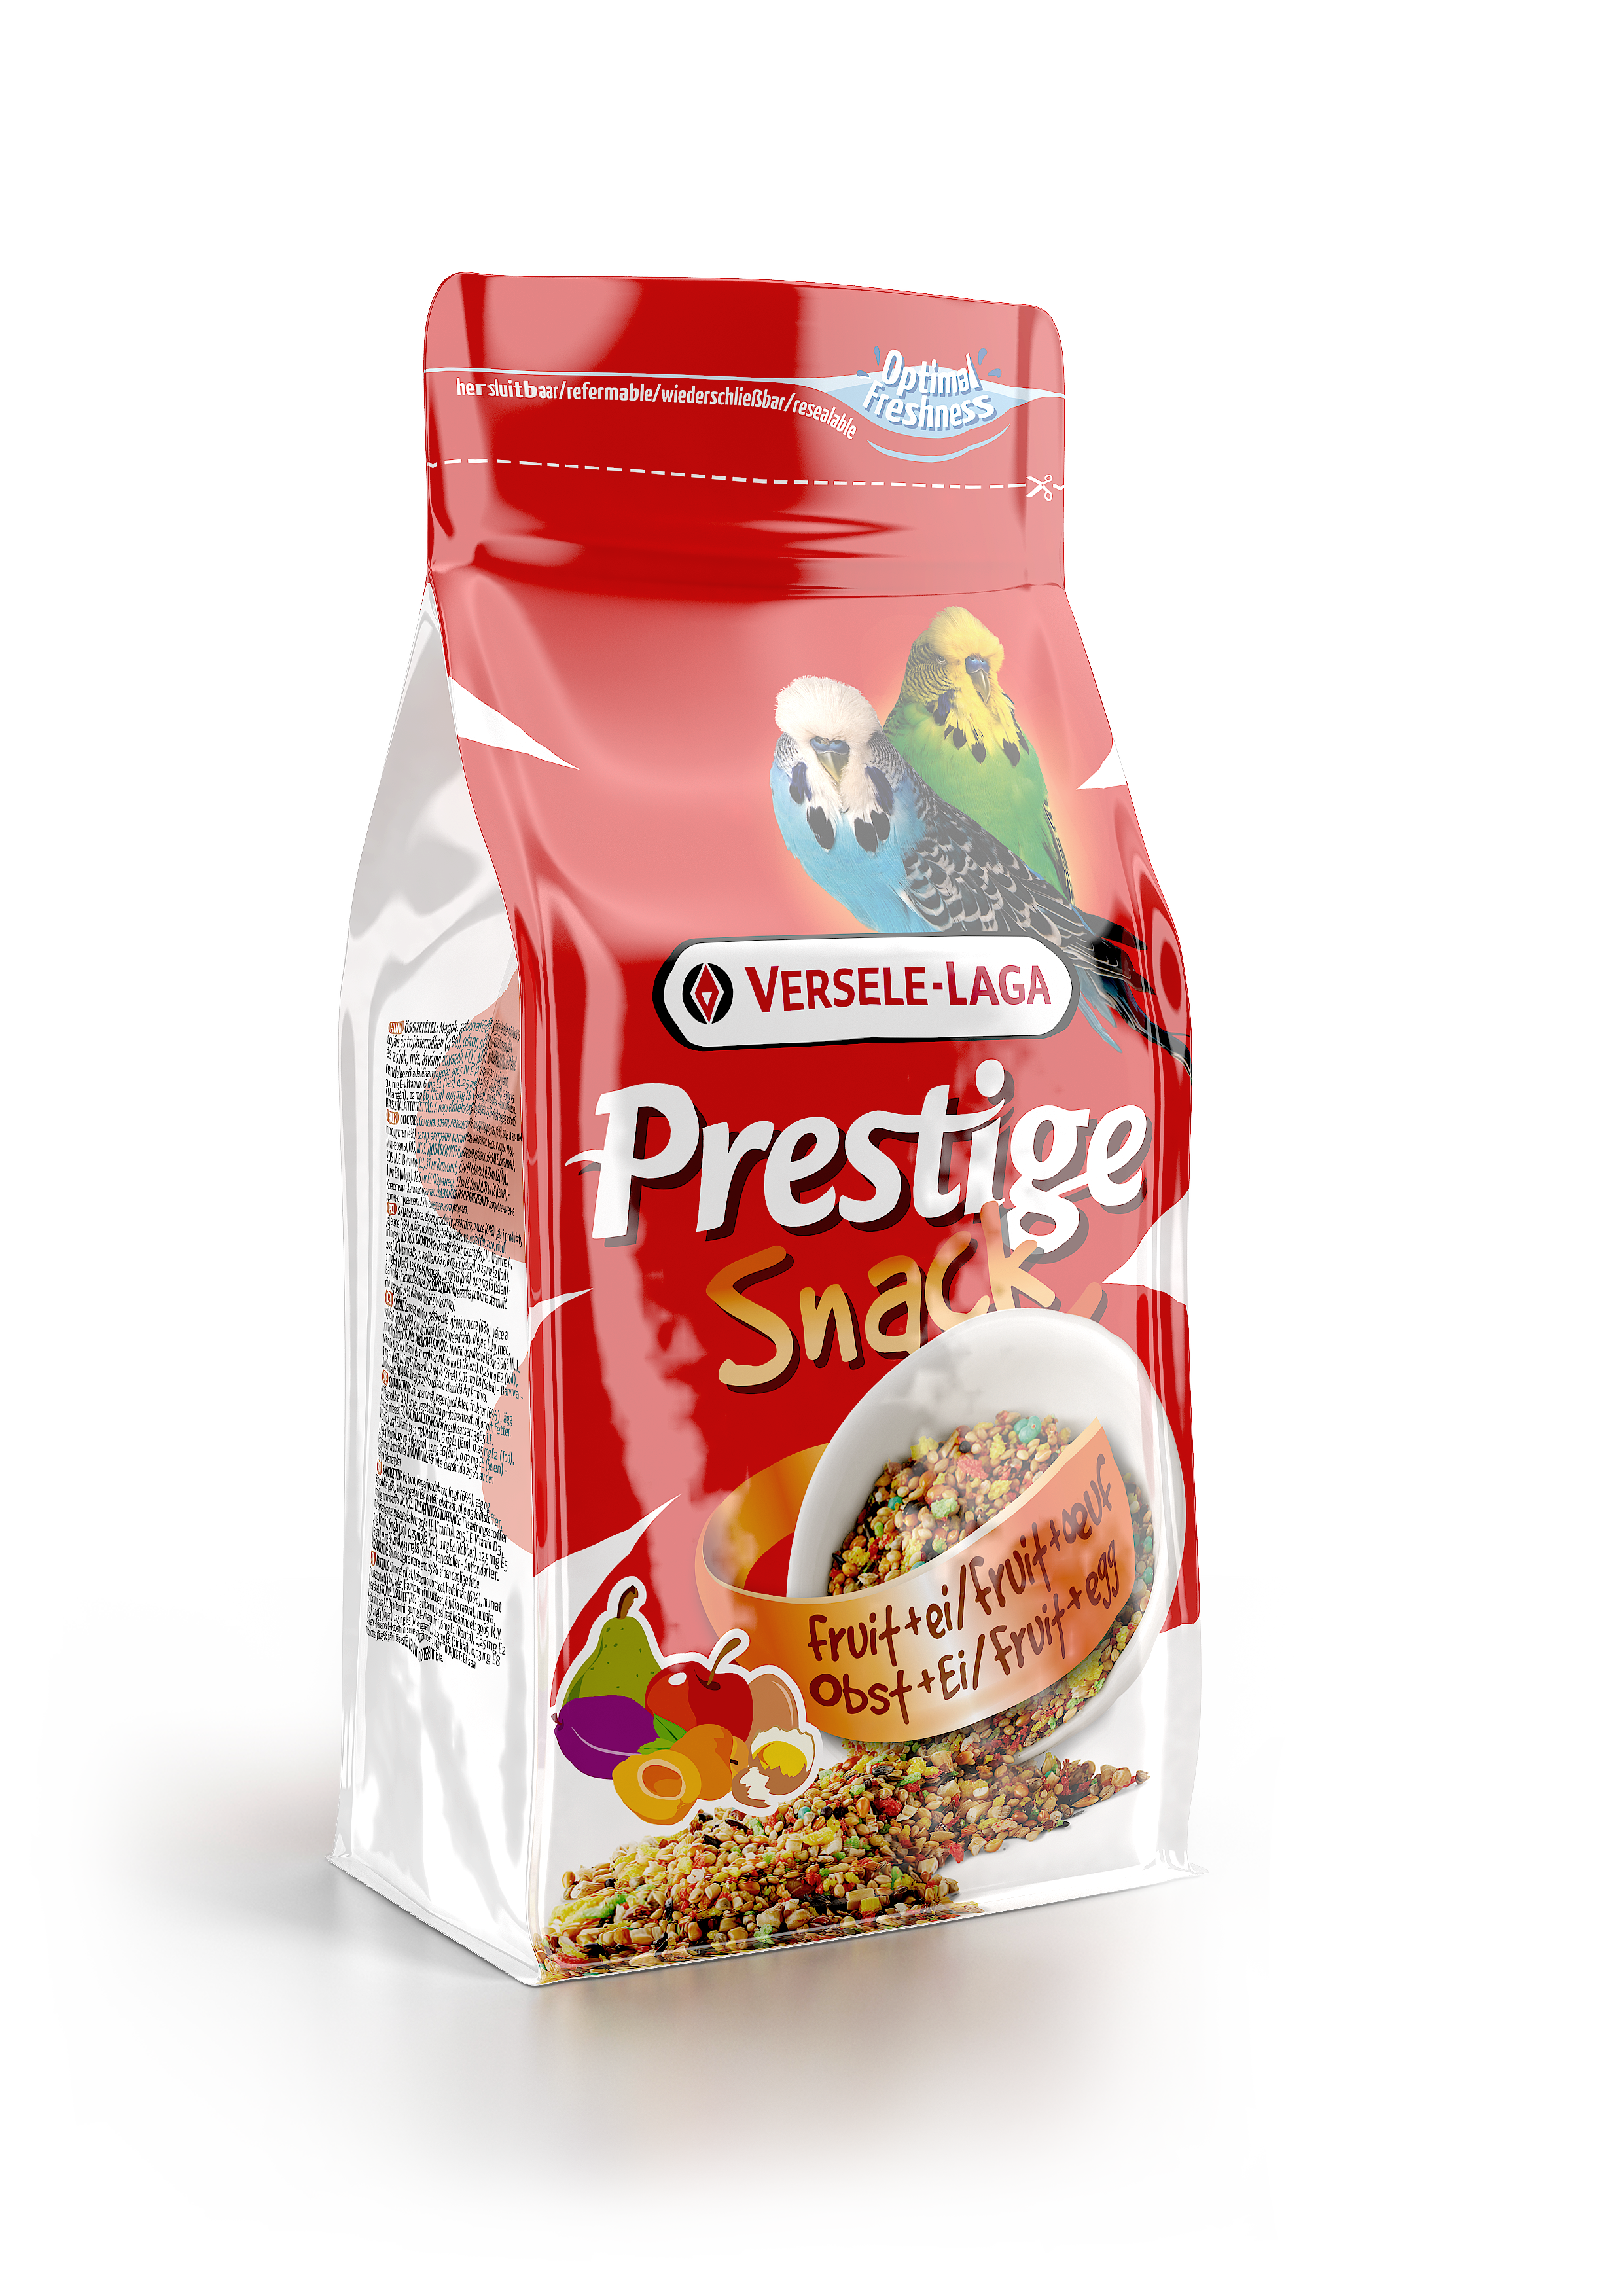 Prestige Snack Periquitos 125gr. (VL422282)